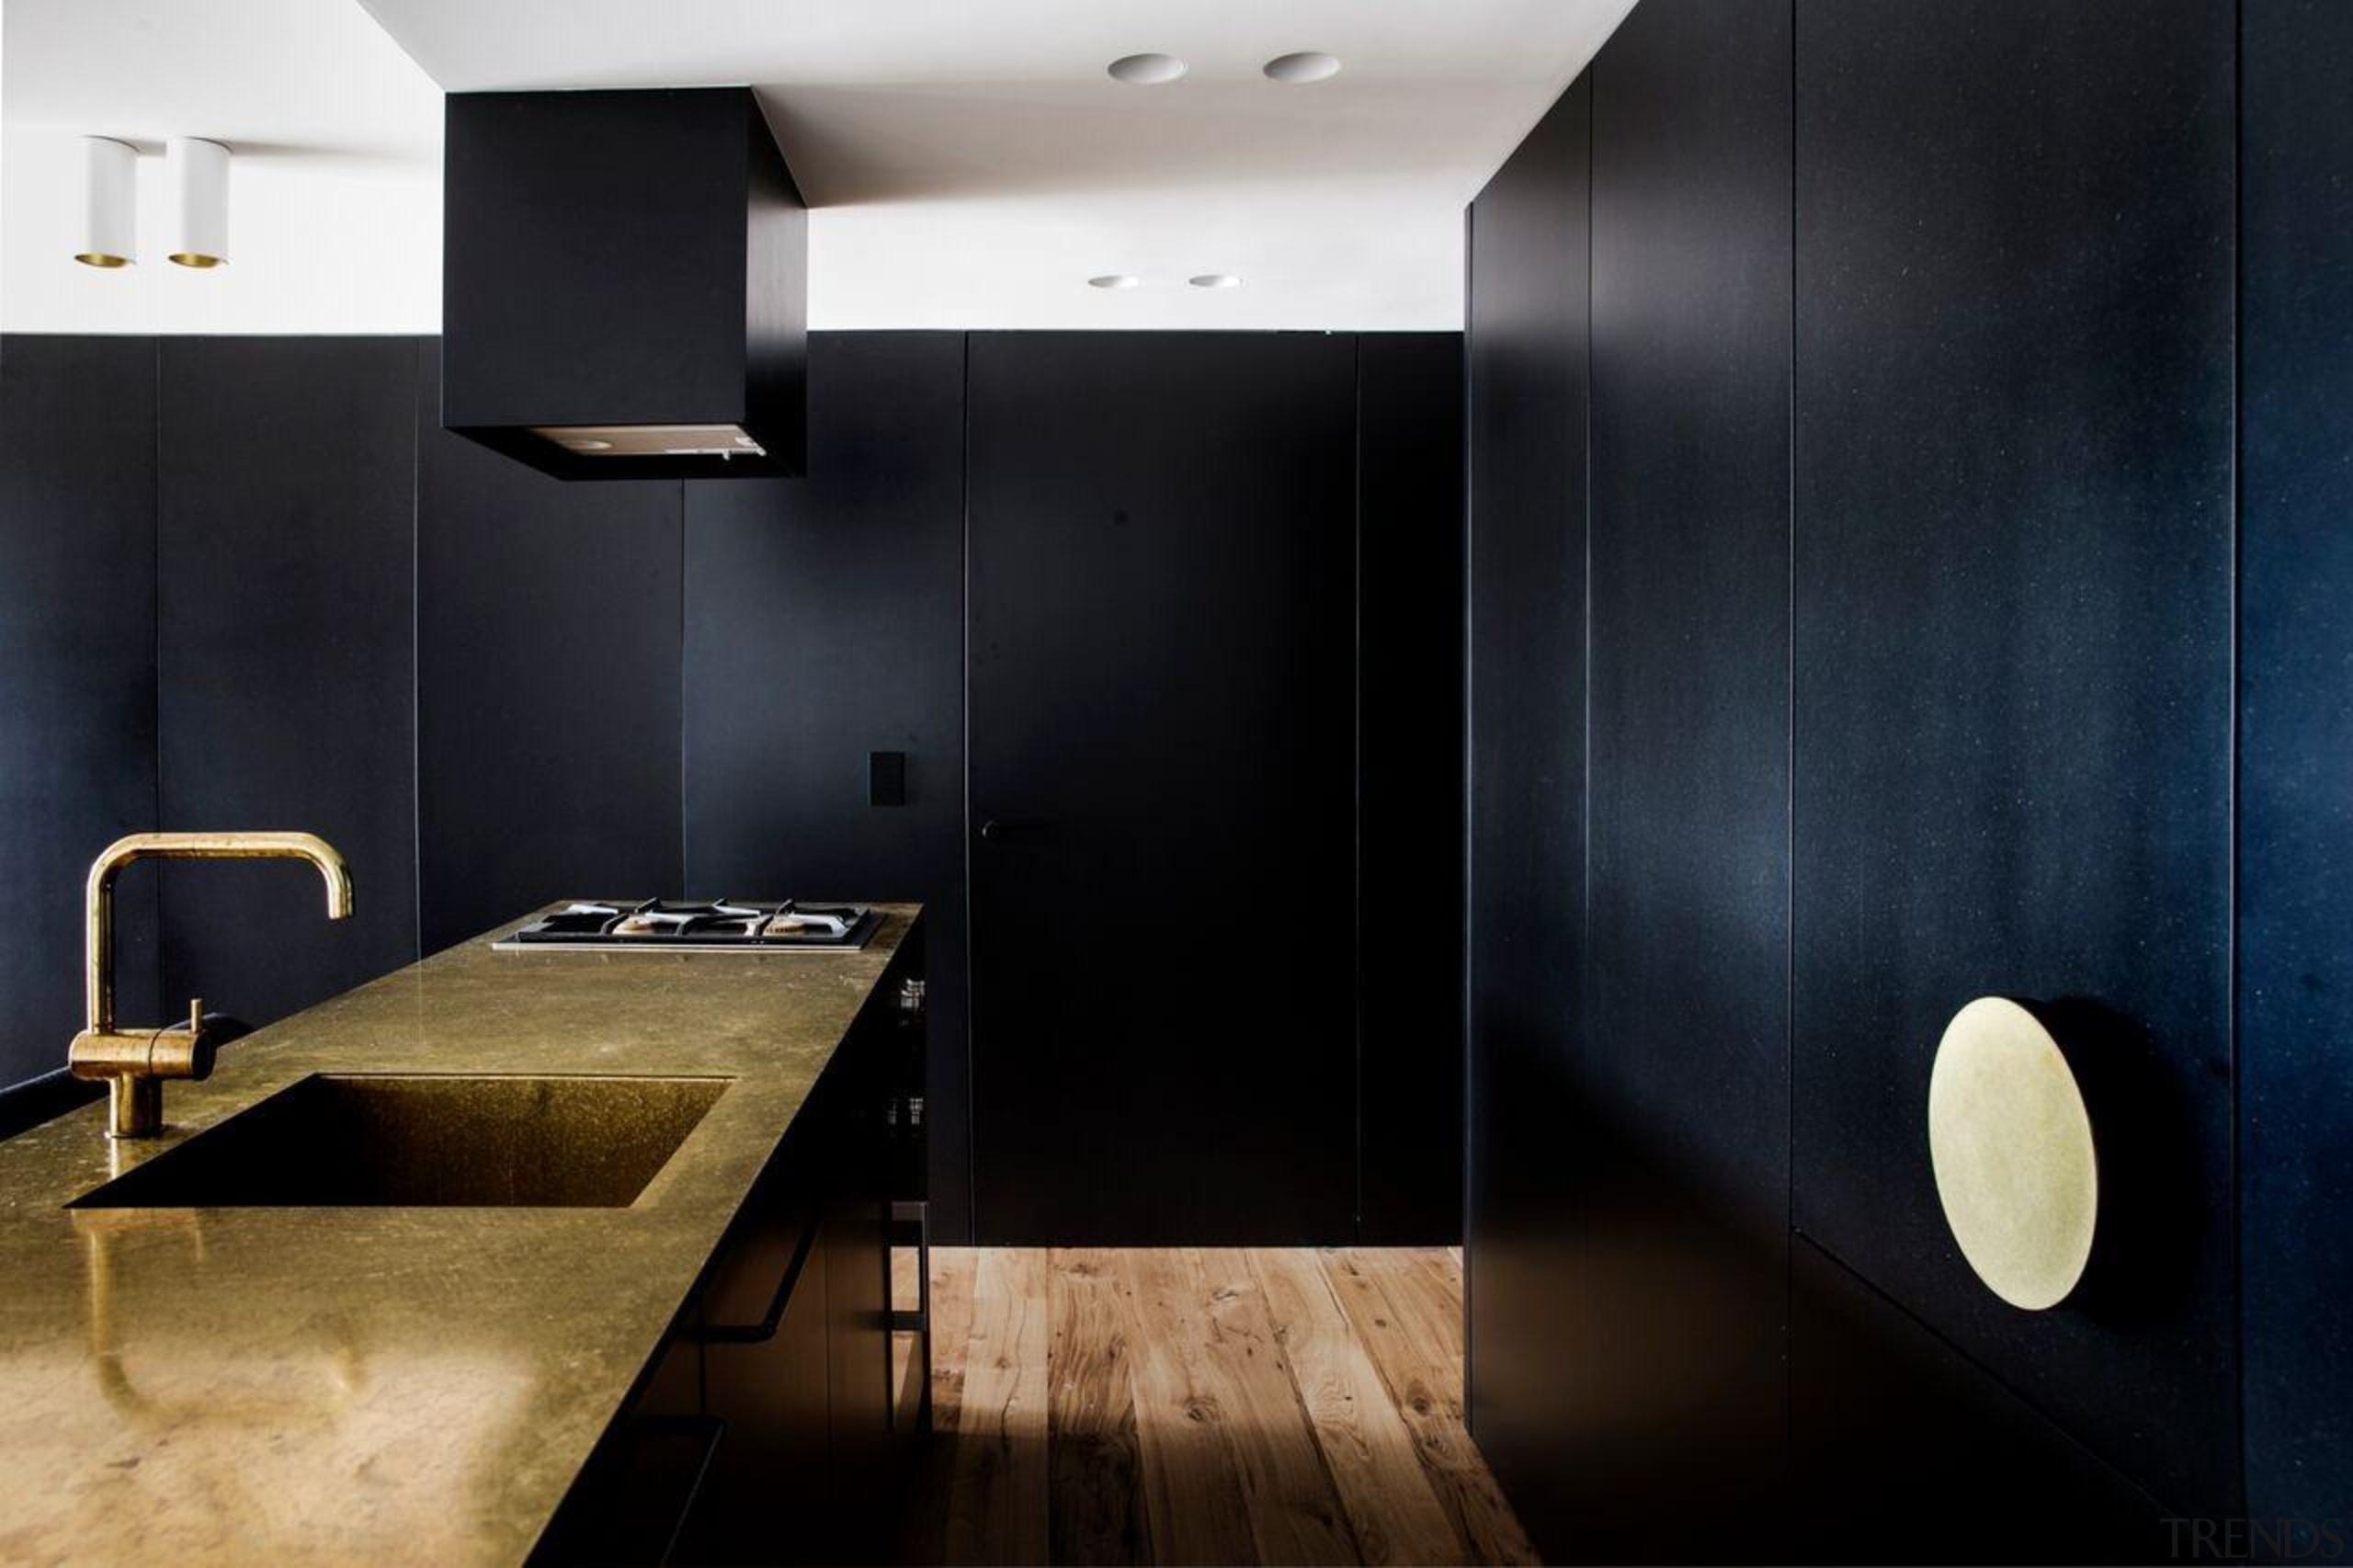 Architect: Architect Prinea - X - architecture | architecture, ceiling, floor, flooring, interior design, lighting, product design, wall, black